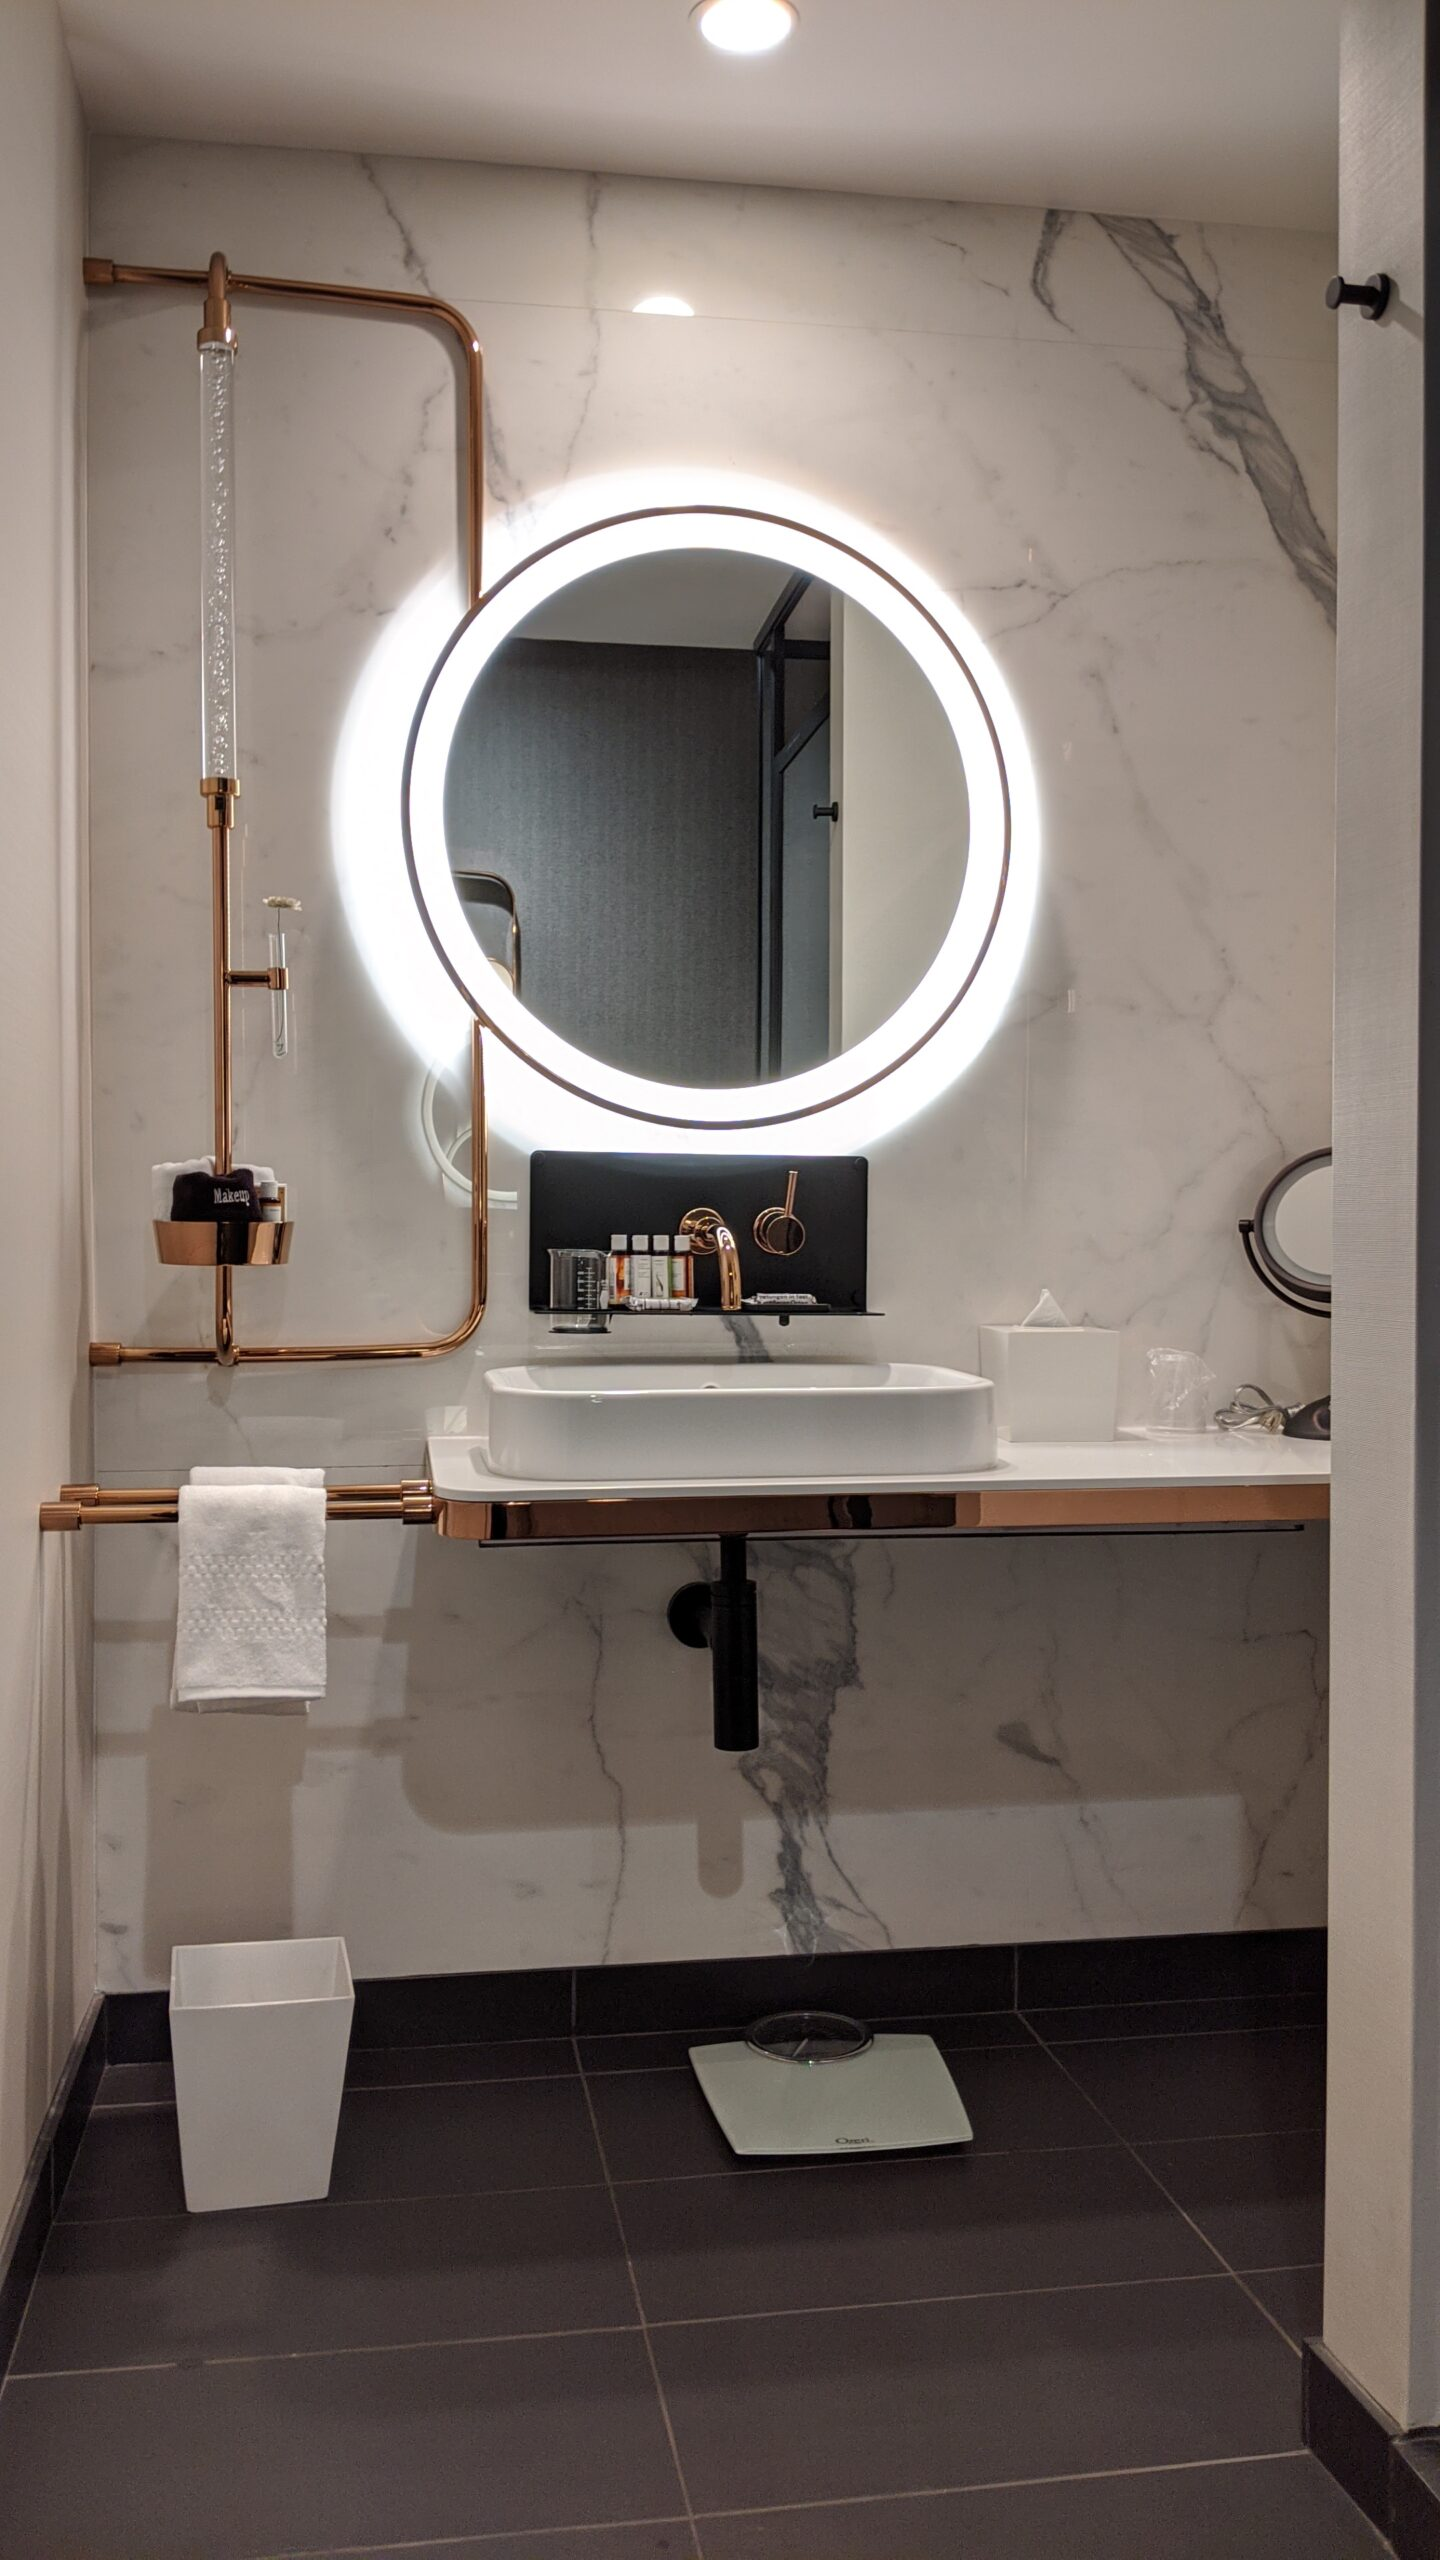 Bathroom at EMC2